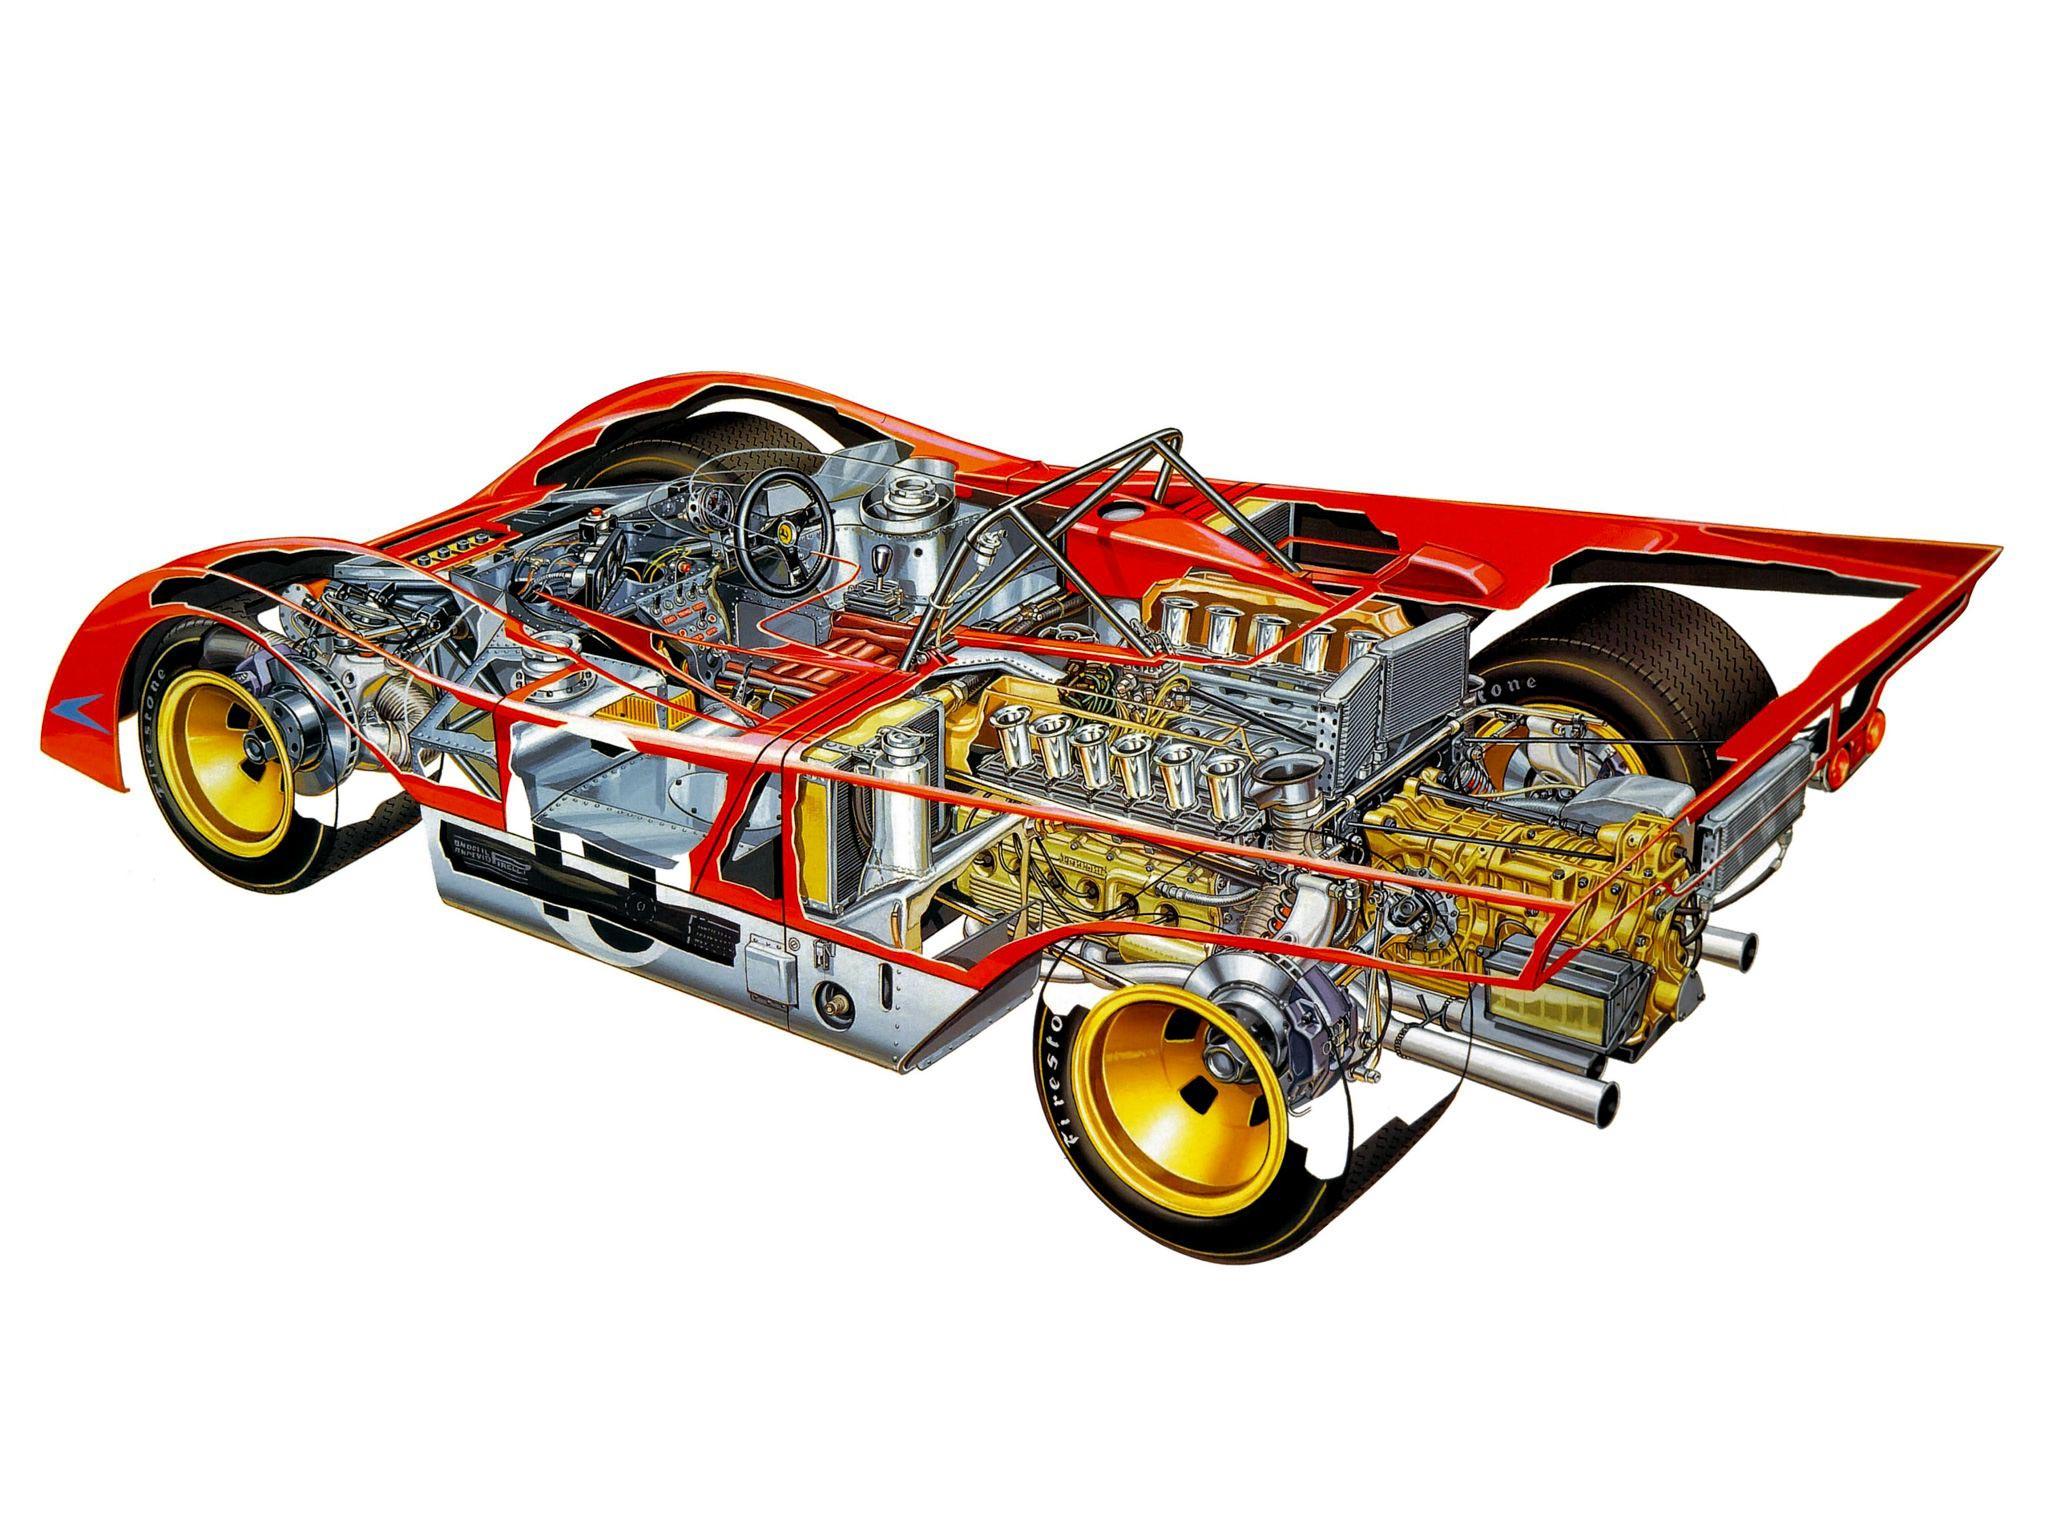 Ferrari 312 PB cutaway drawing